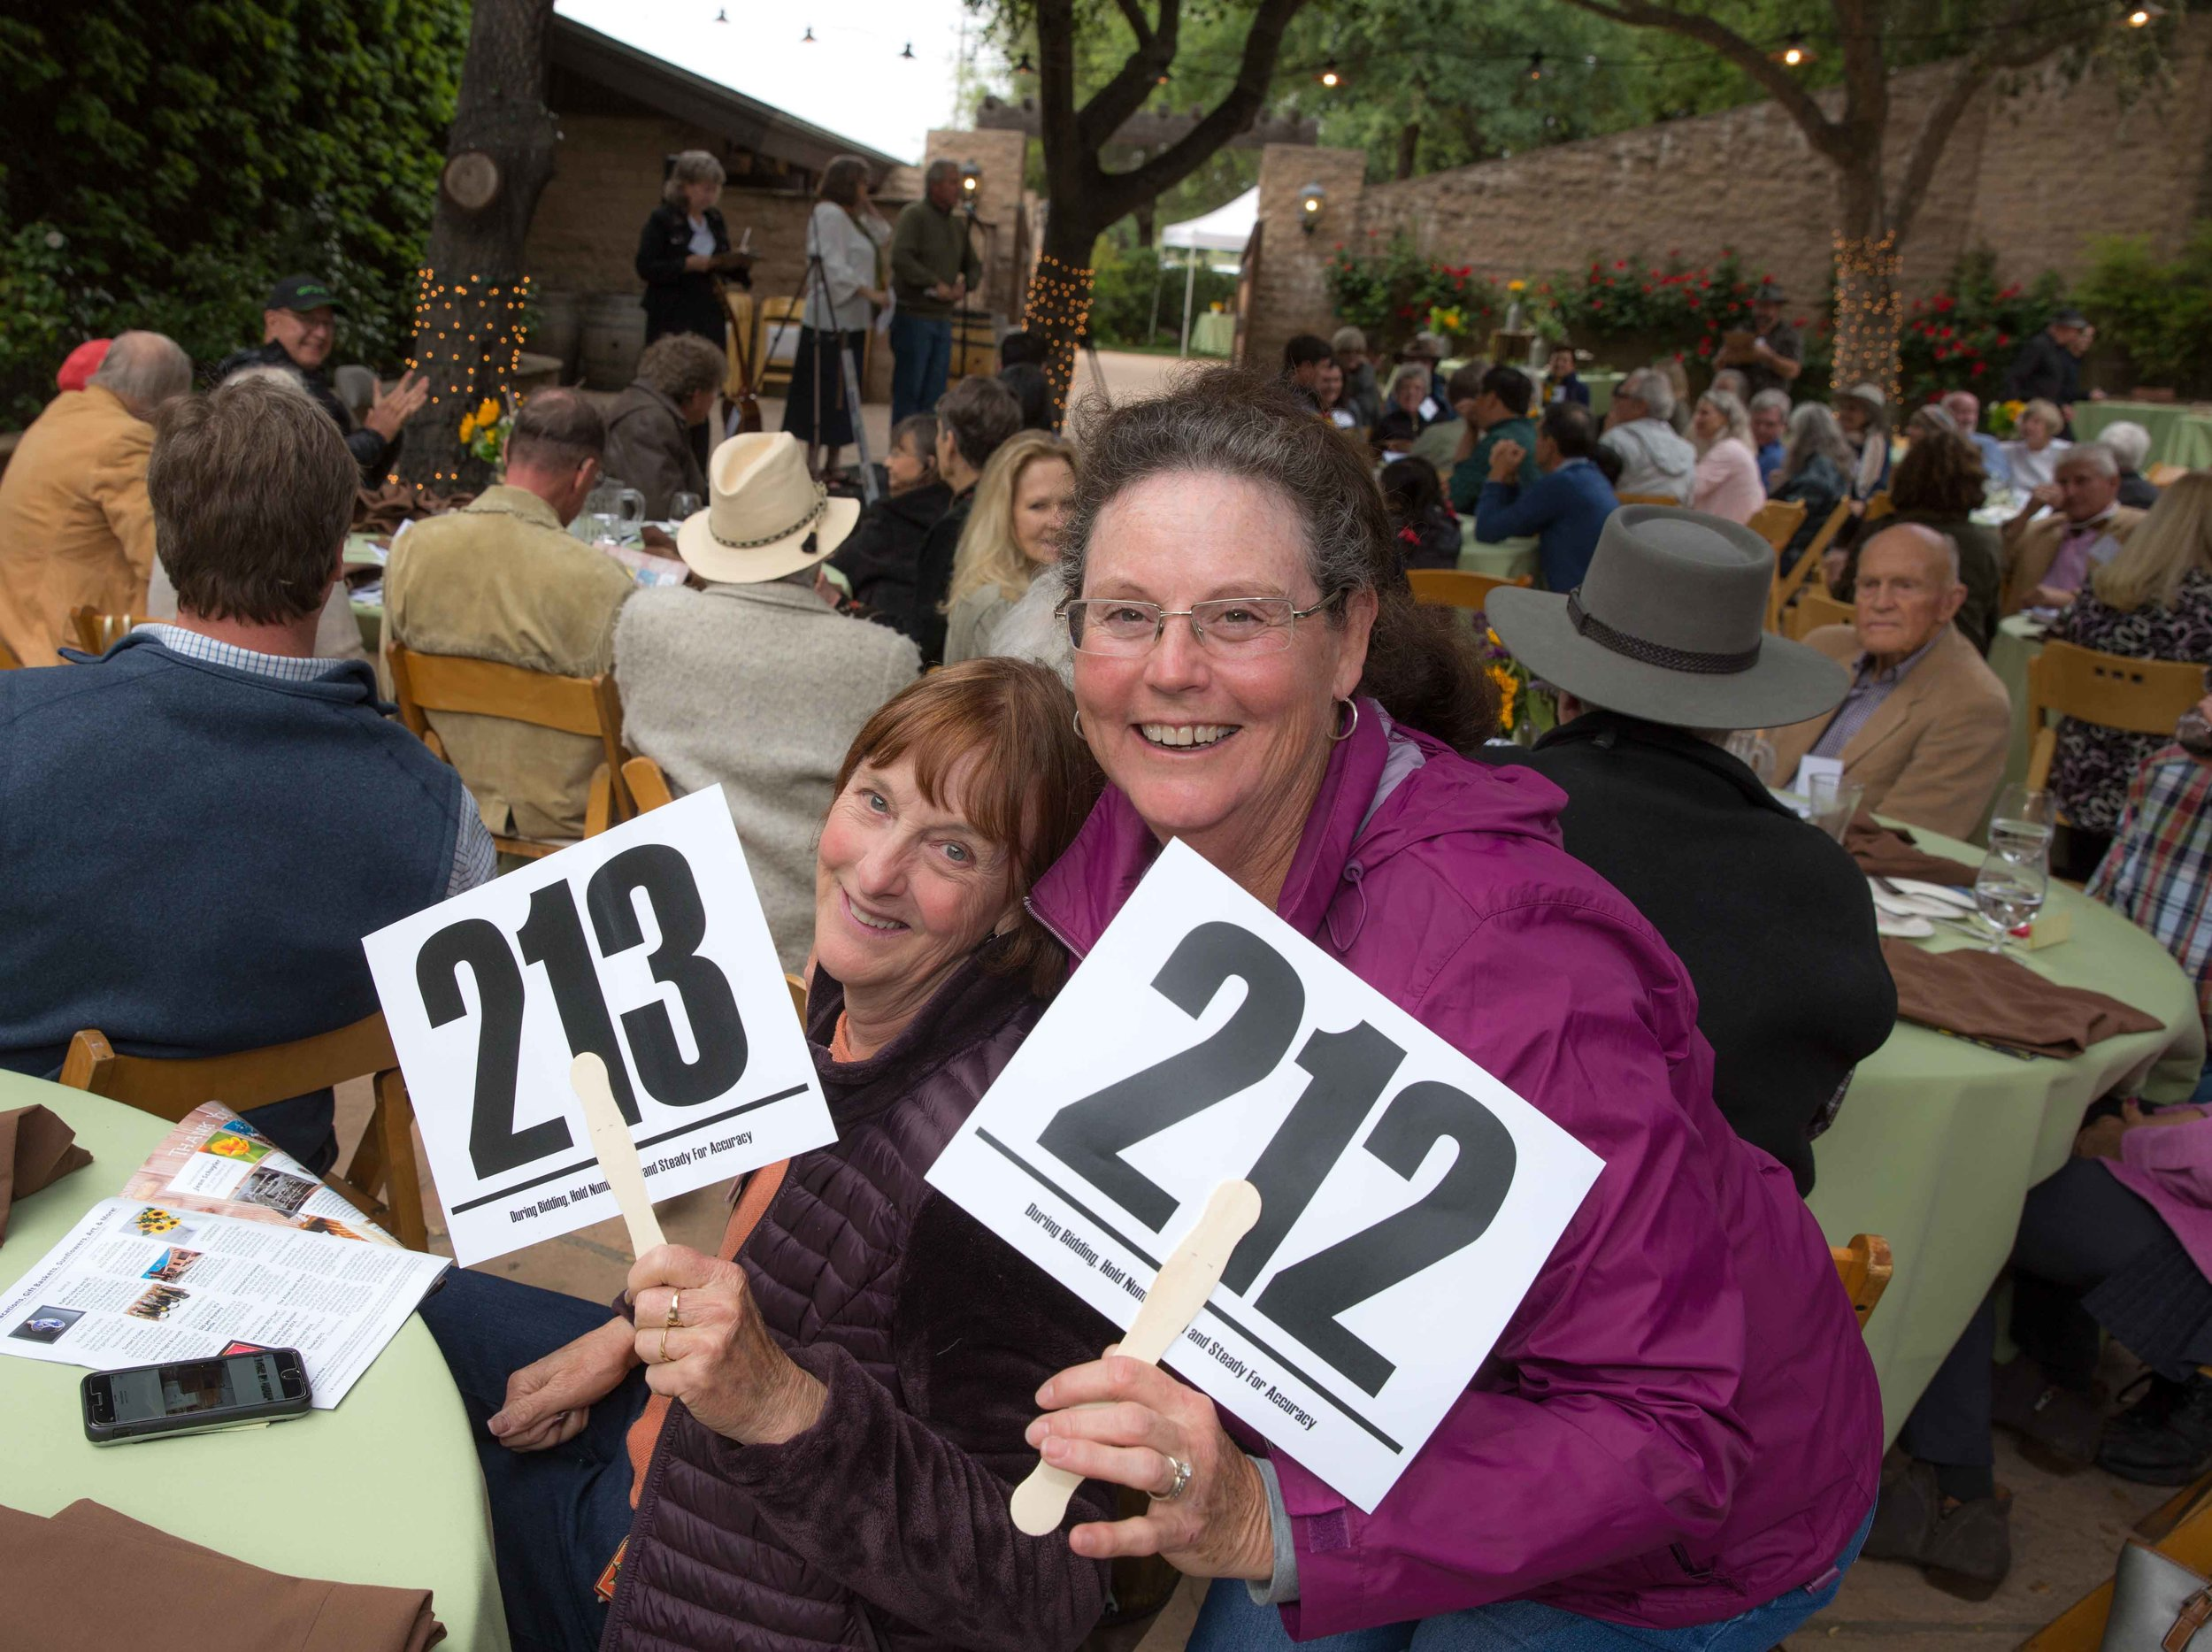 Sharon Metsch and Kathleen Rosenthal